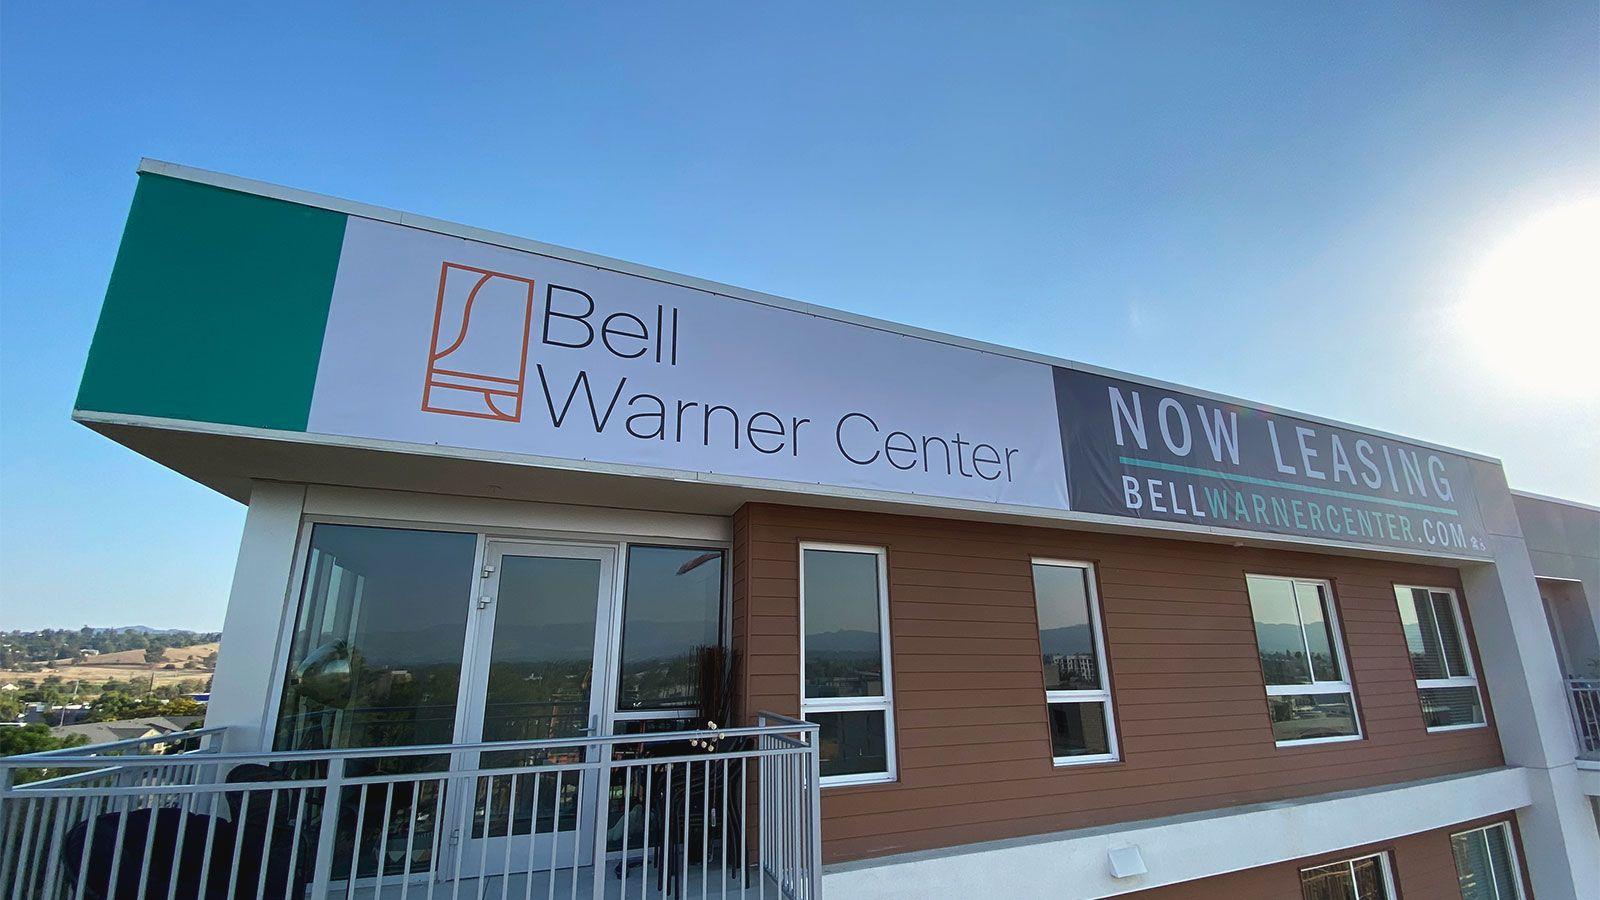 Bell warner center vinyl banners